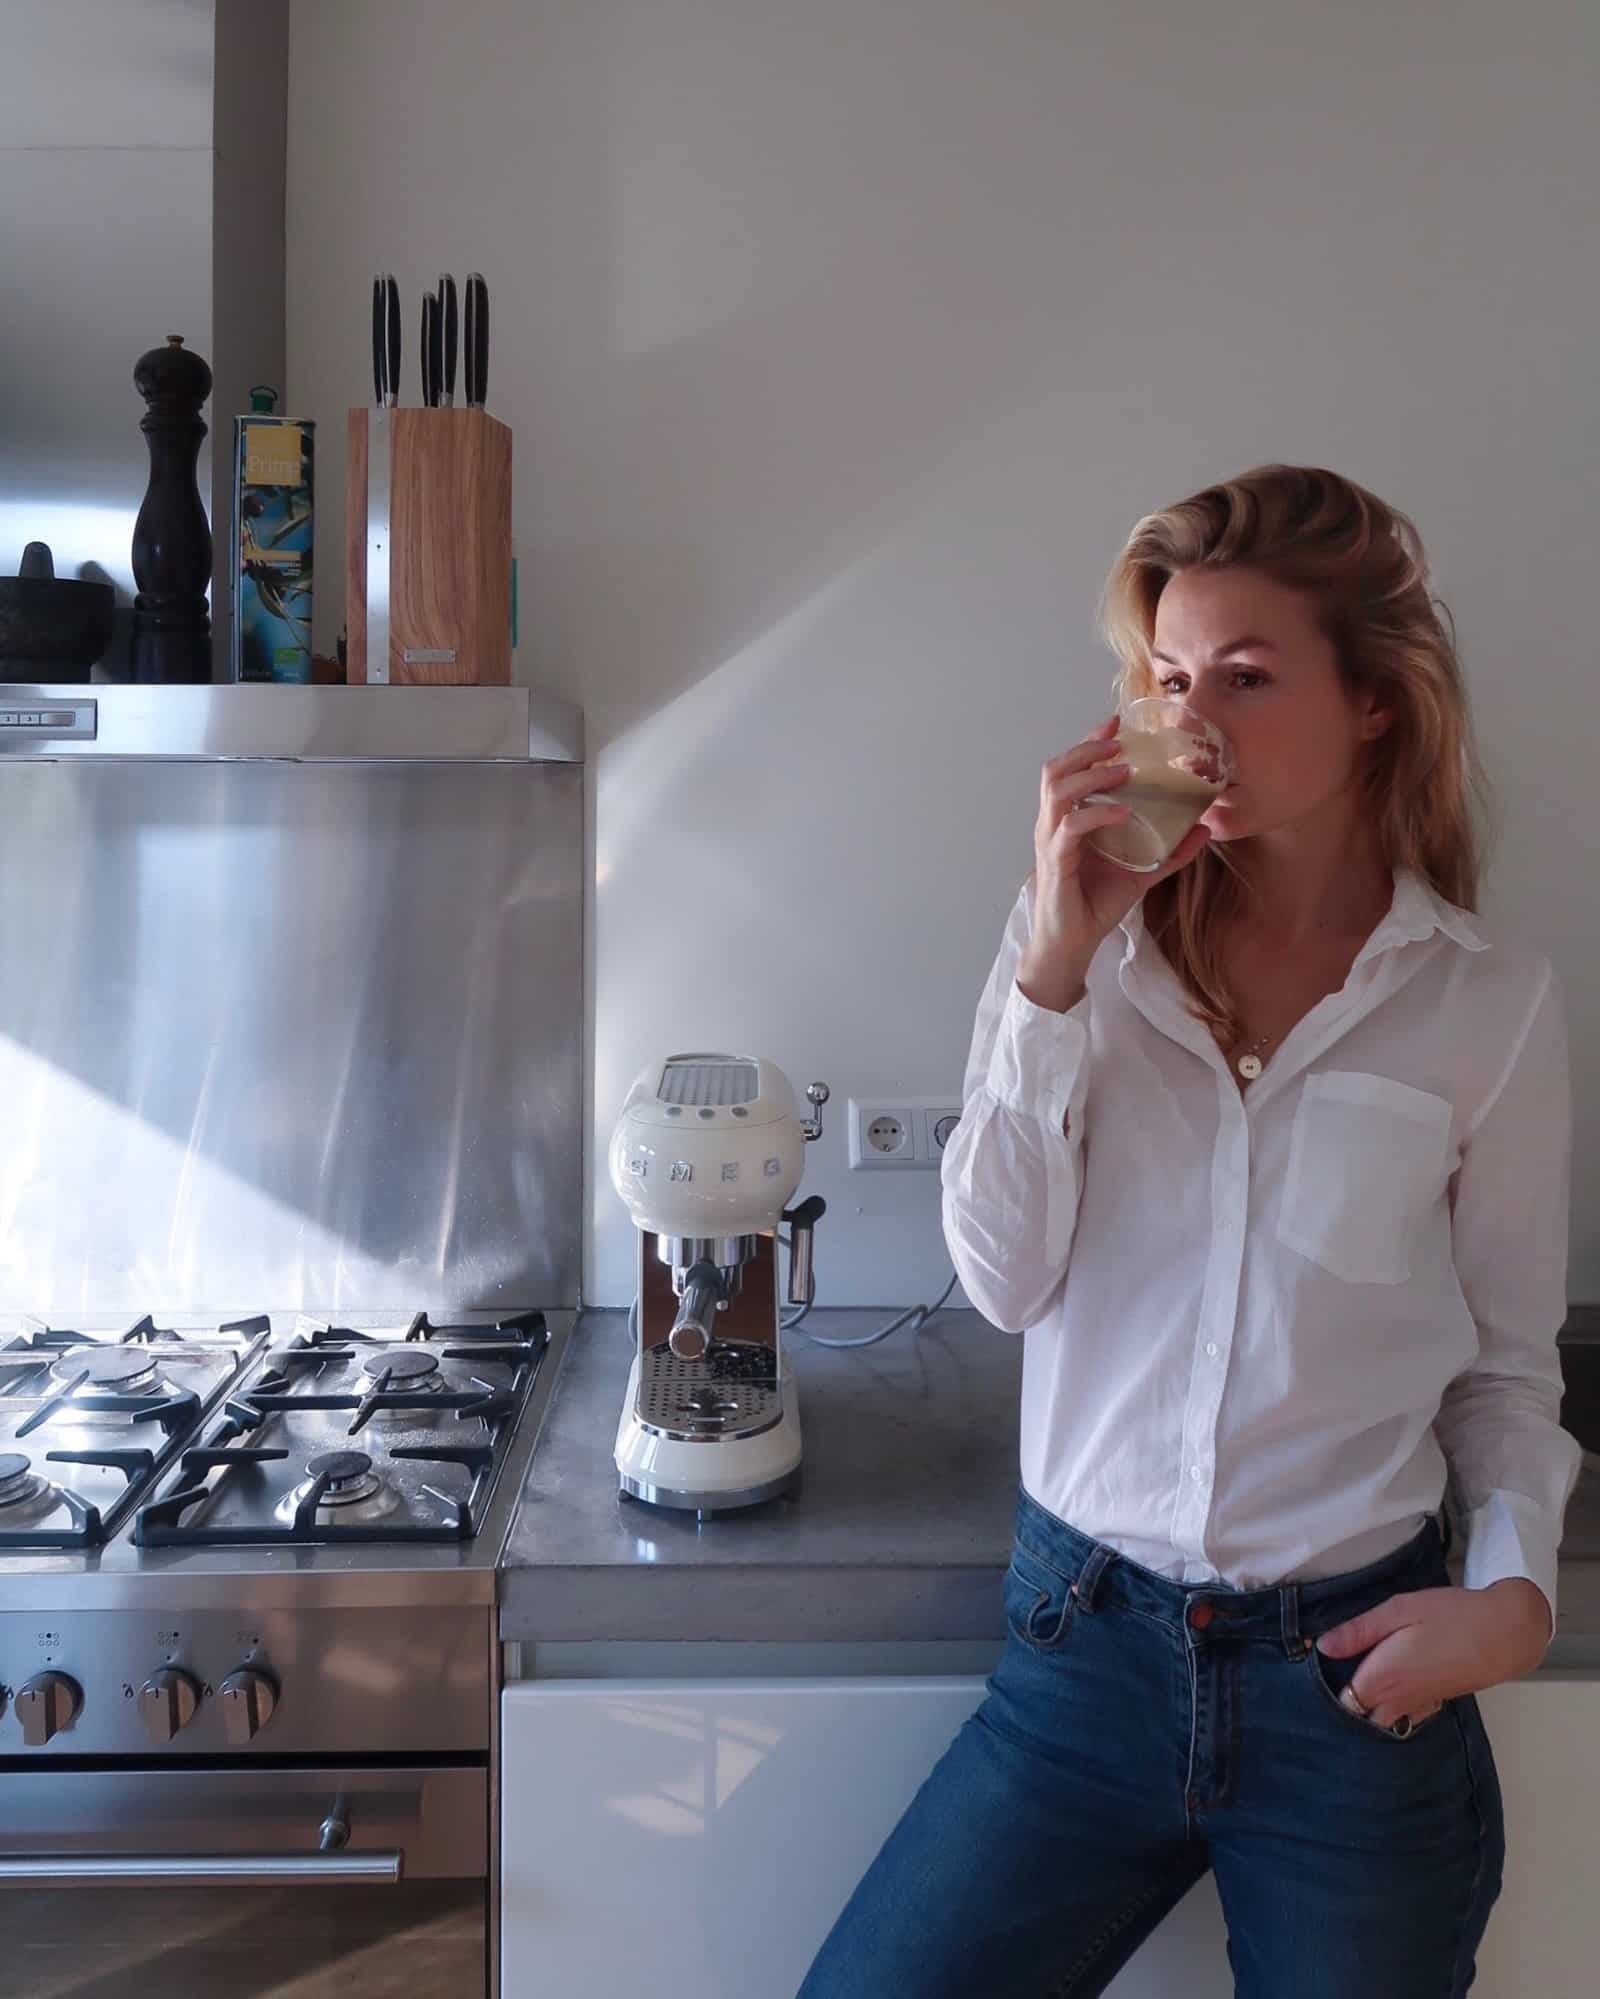 koffiemachine van Smeg